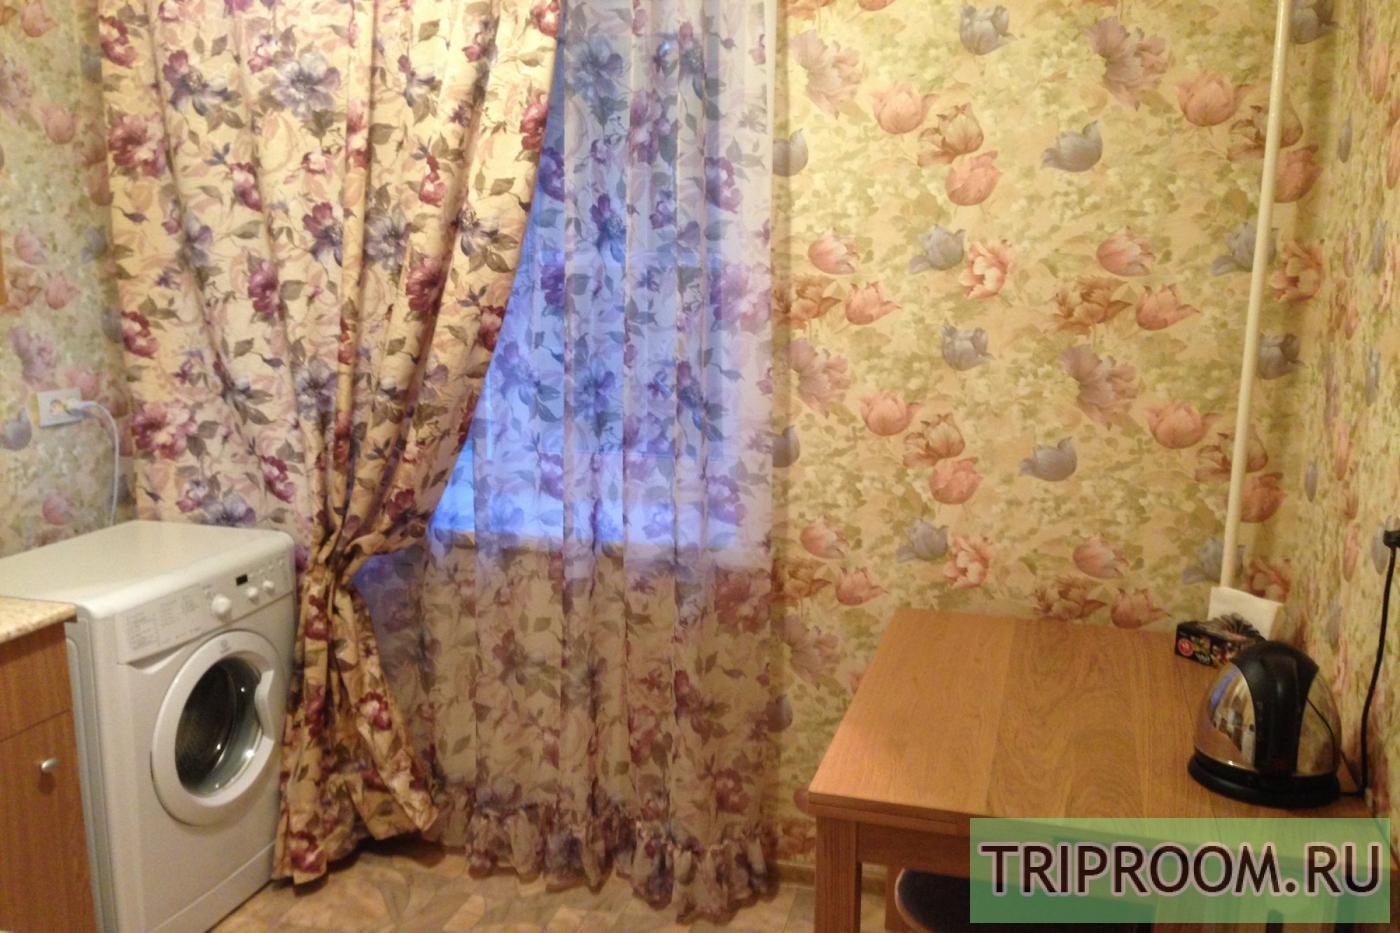 2-комнатная квартира посуточно (вариант № 20611), ул. Титова улица, фото № 4